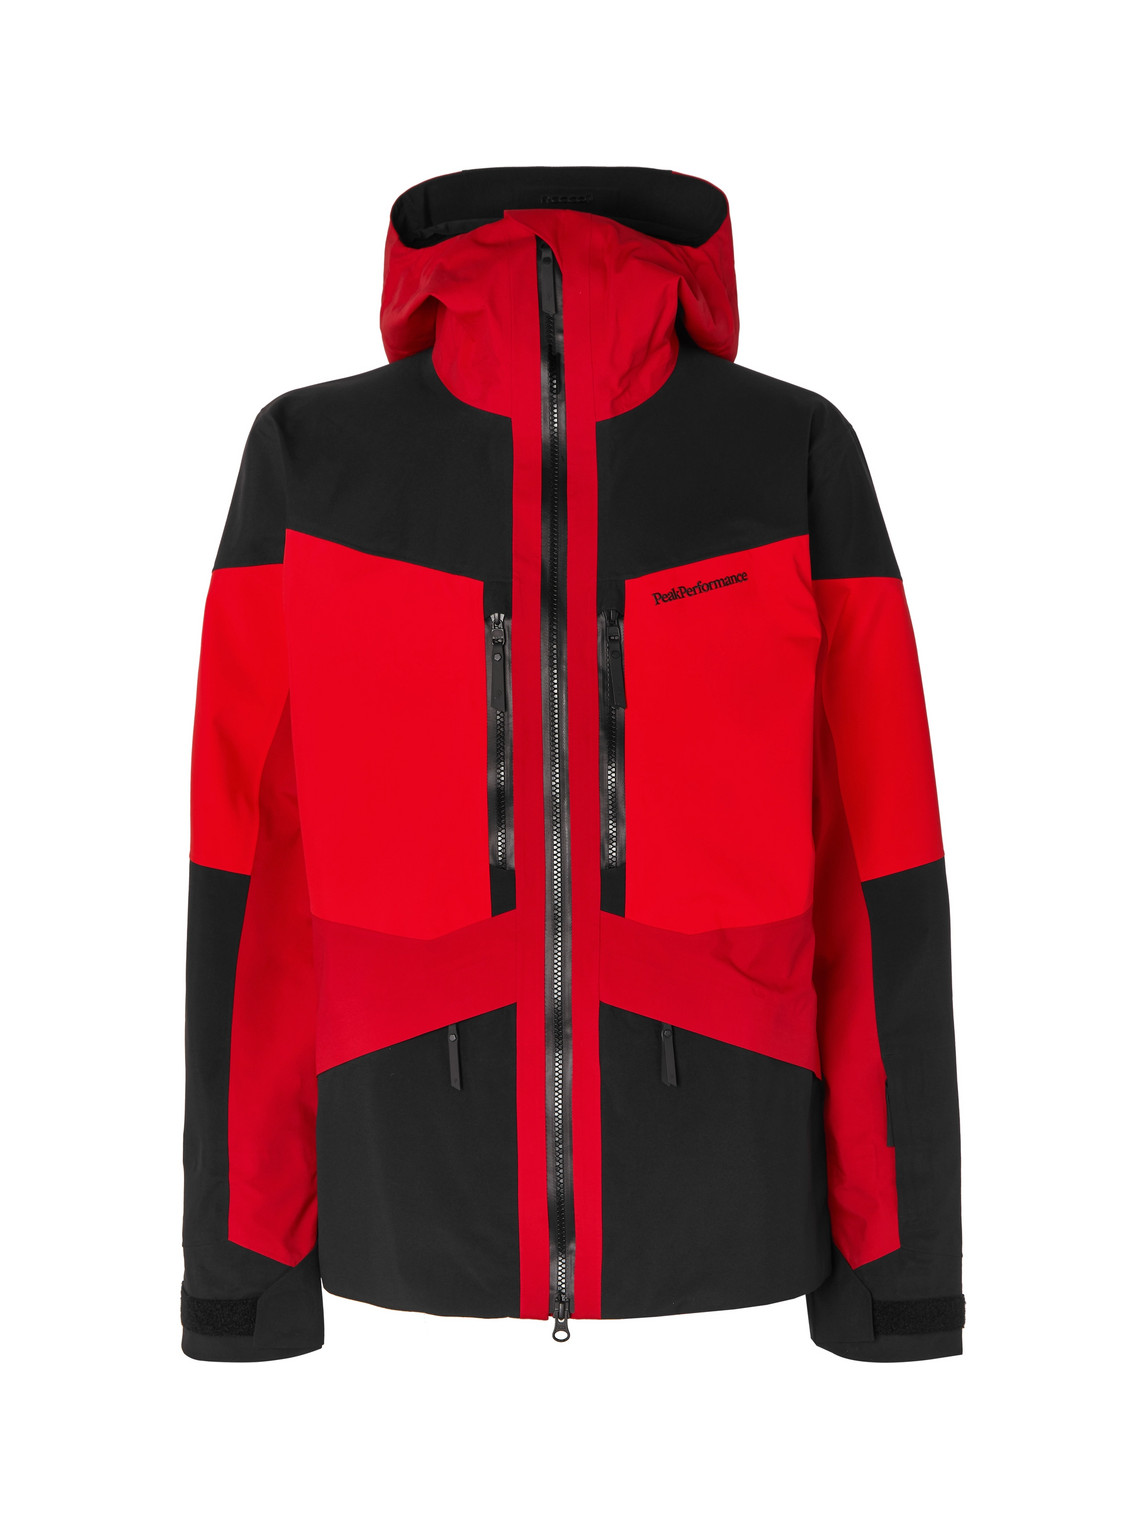 peak performance - gravity colour-block gore-tex ski jacket - men - red - l